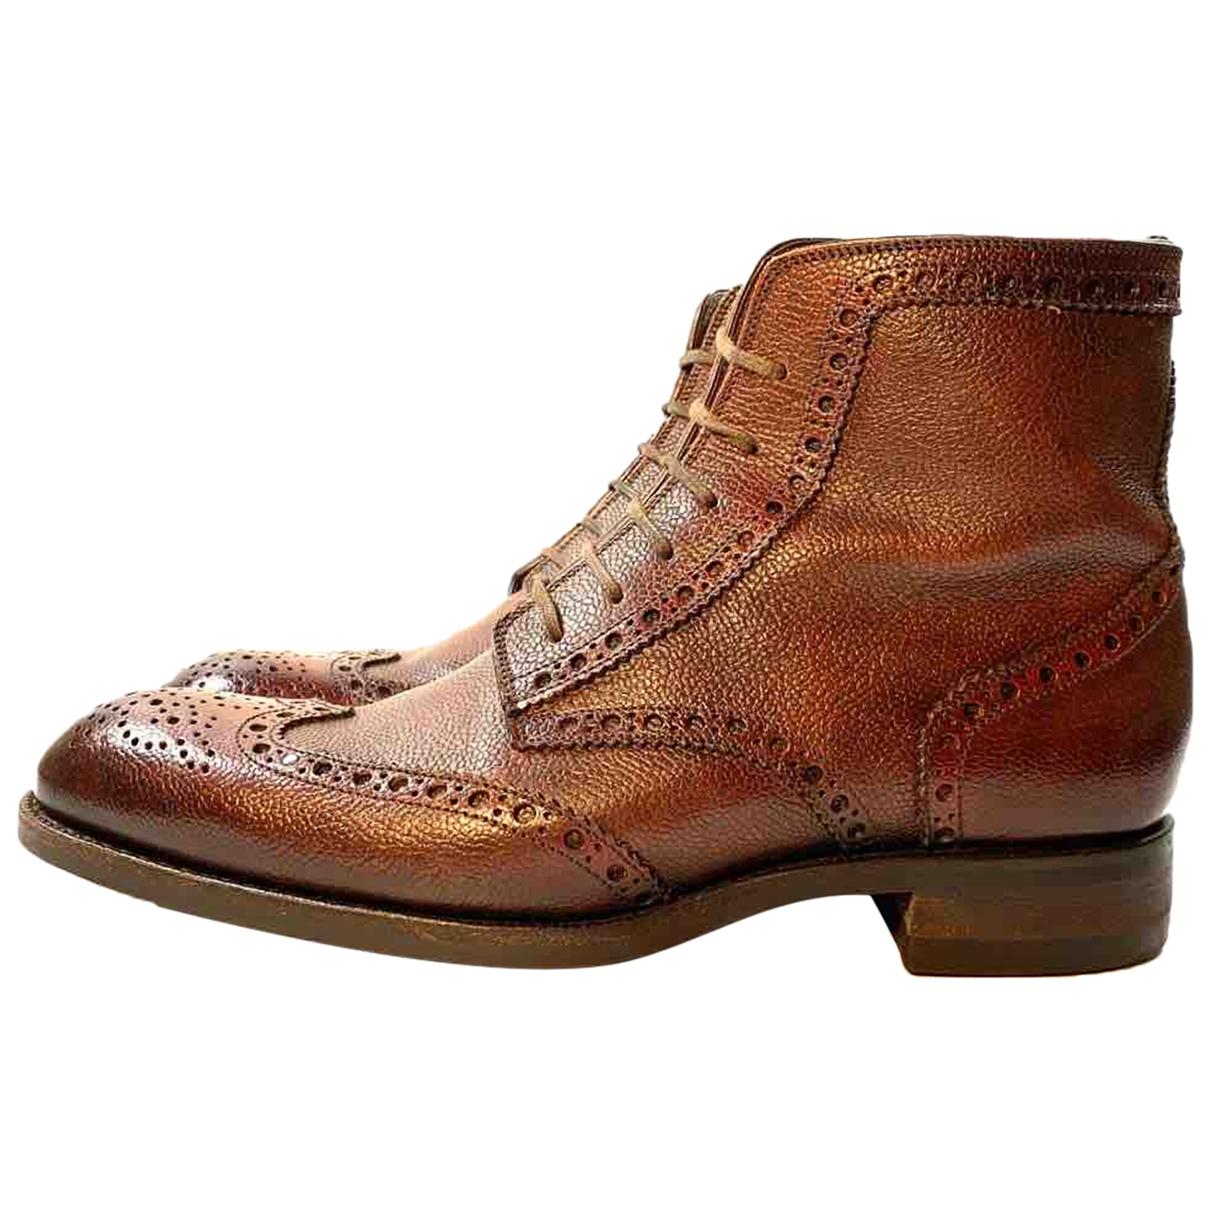 Botas de Cuero Tom Ford